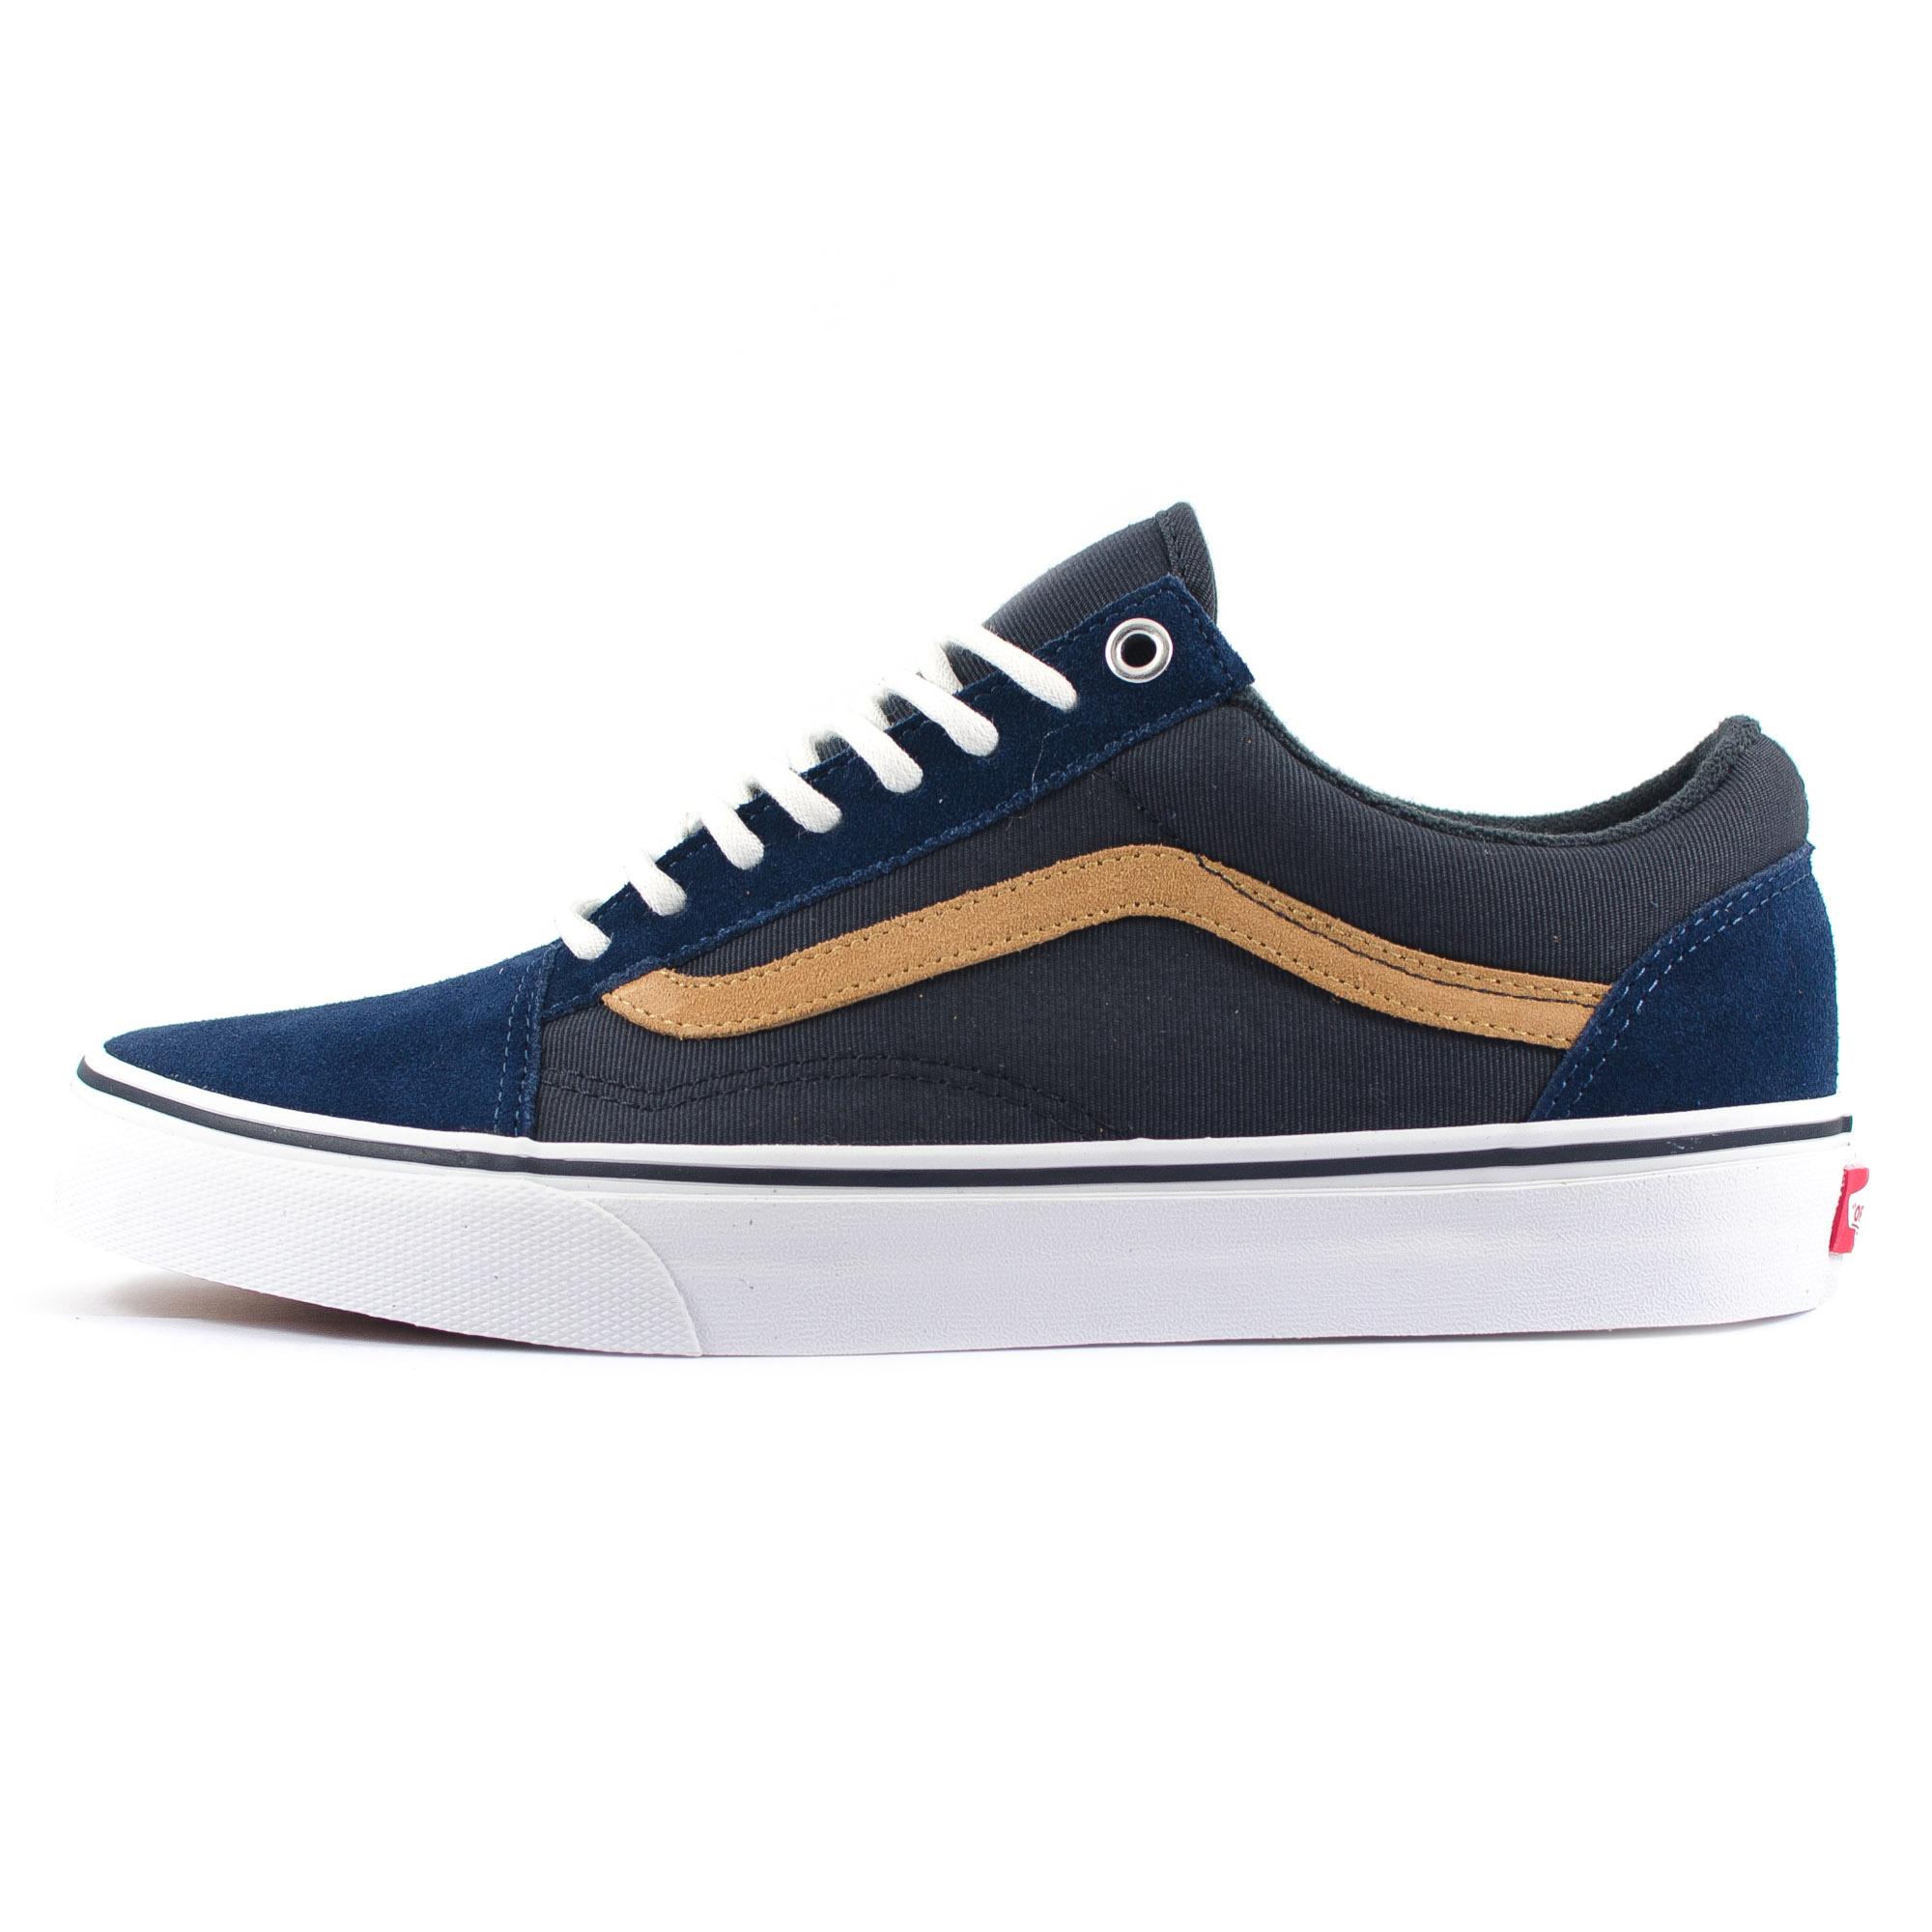 Vans Shoes Singapore Price